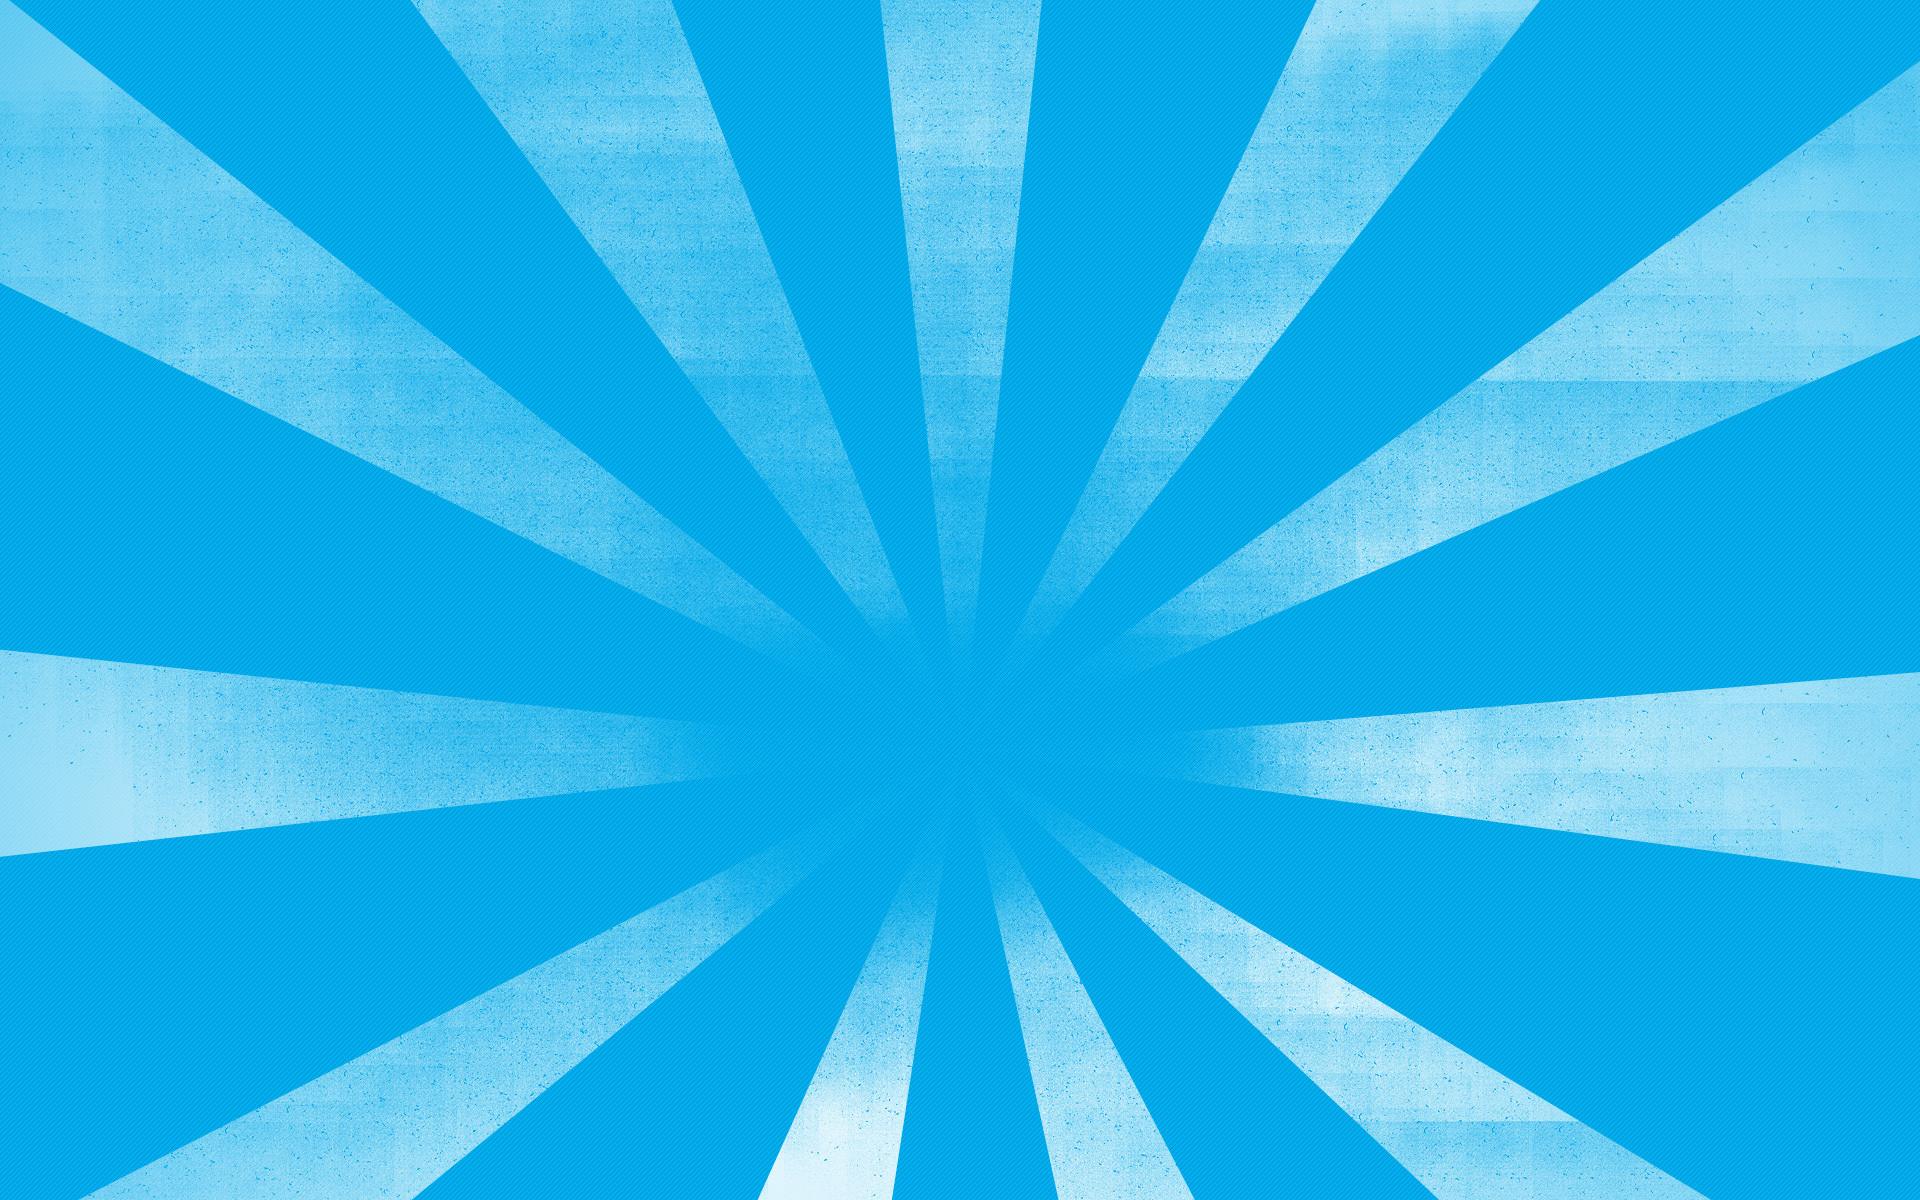 Blue Wallpaper Abstract Design Cool #6606 Wallpaper | Cool .